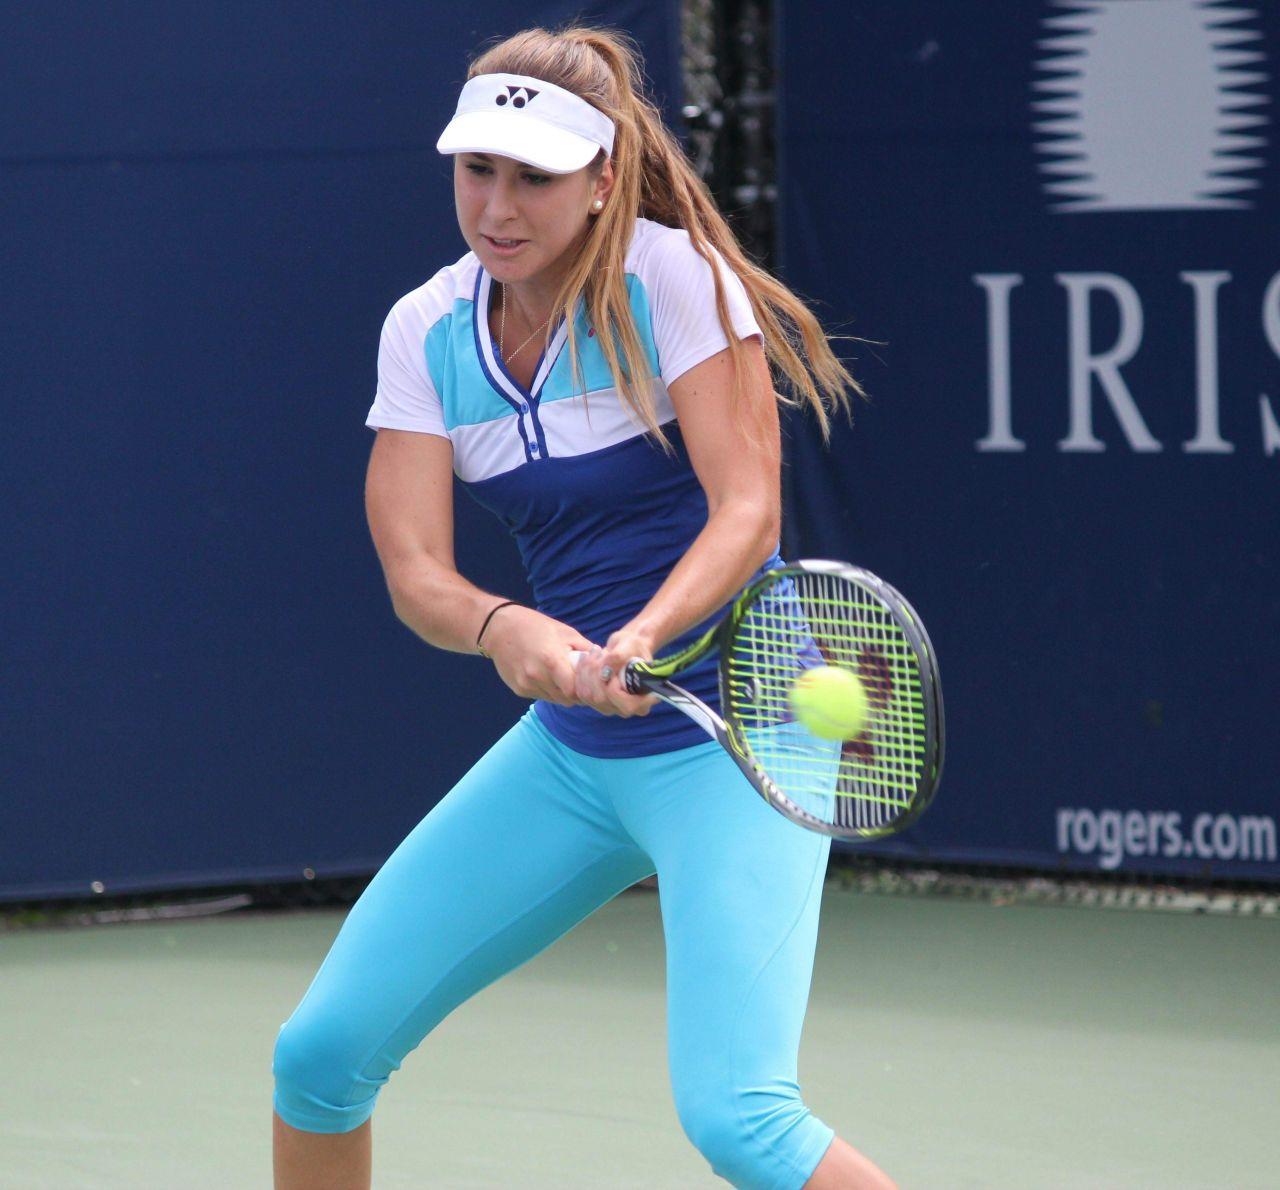 Belinda Bencic - Taining During Rogers Cup in Toronto